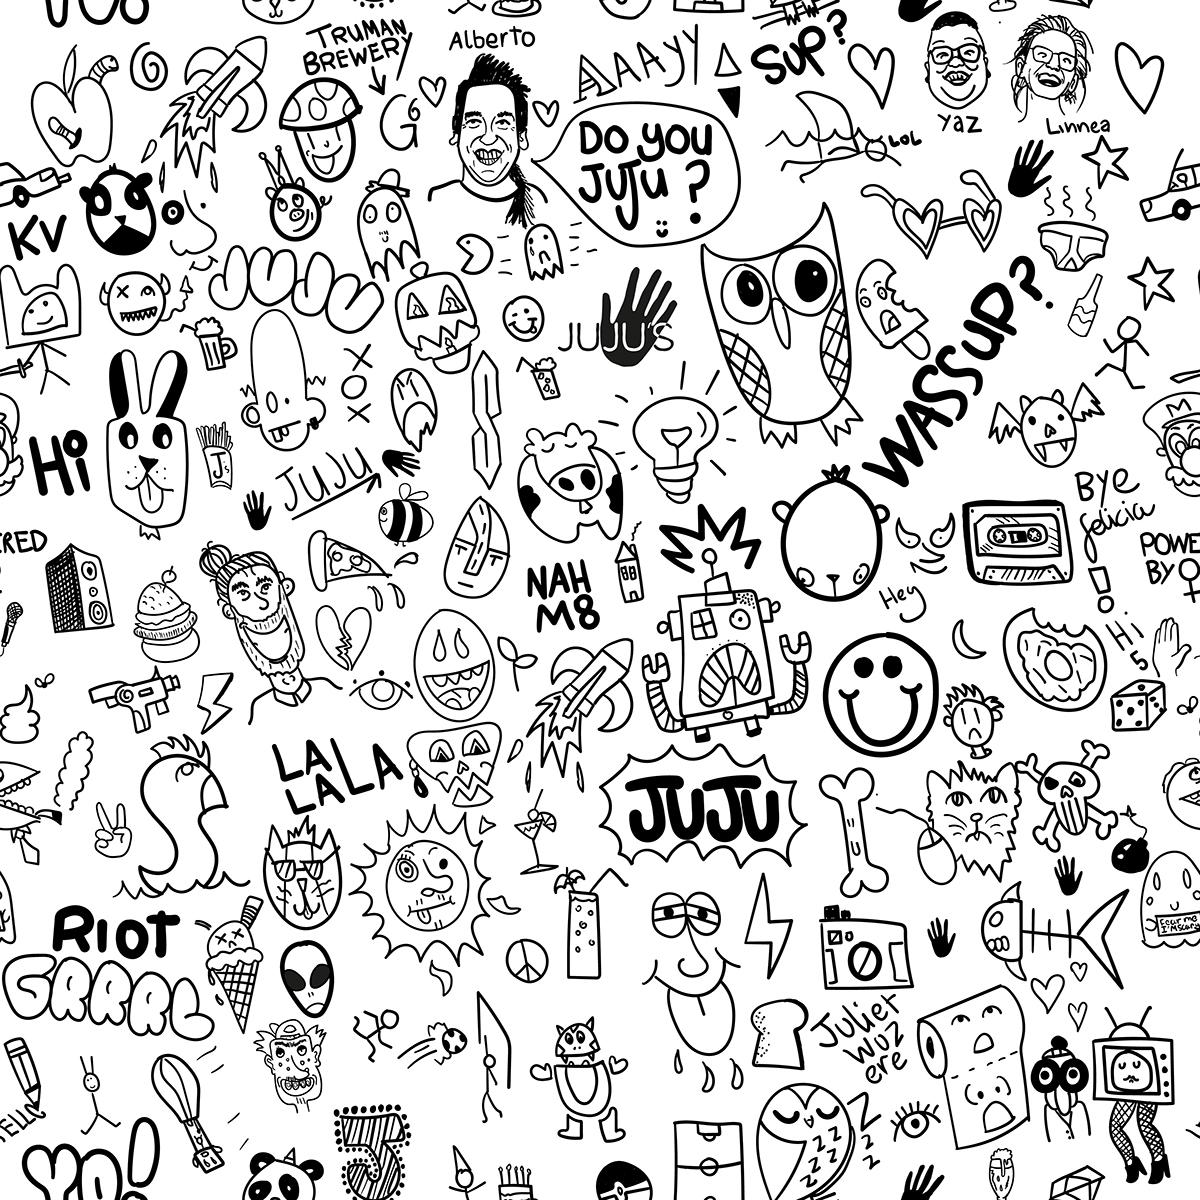 Juju Bar Doodle Wallpaper On Behance